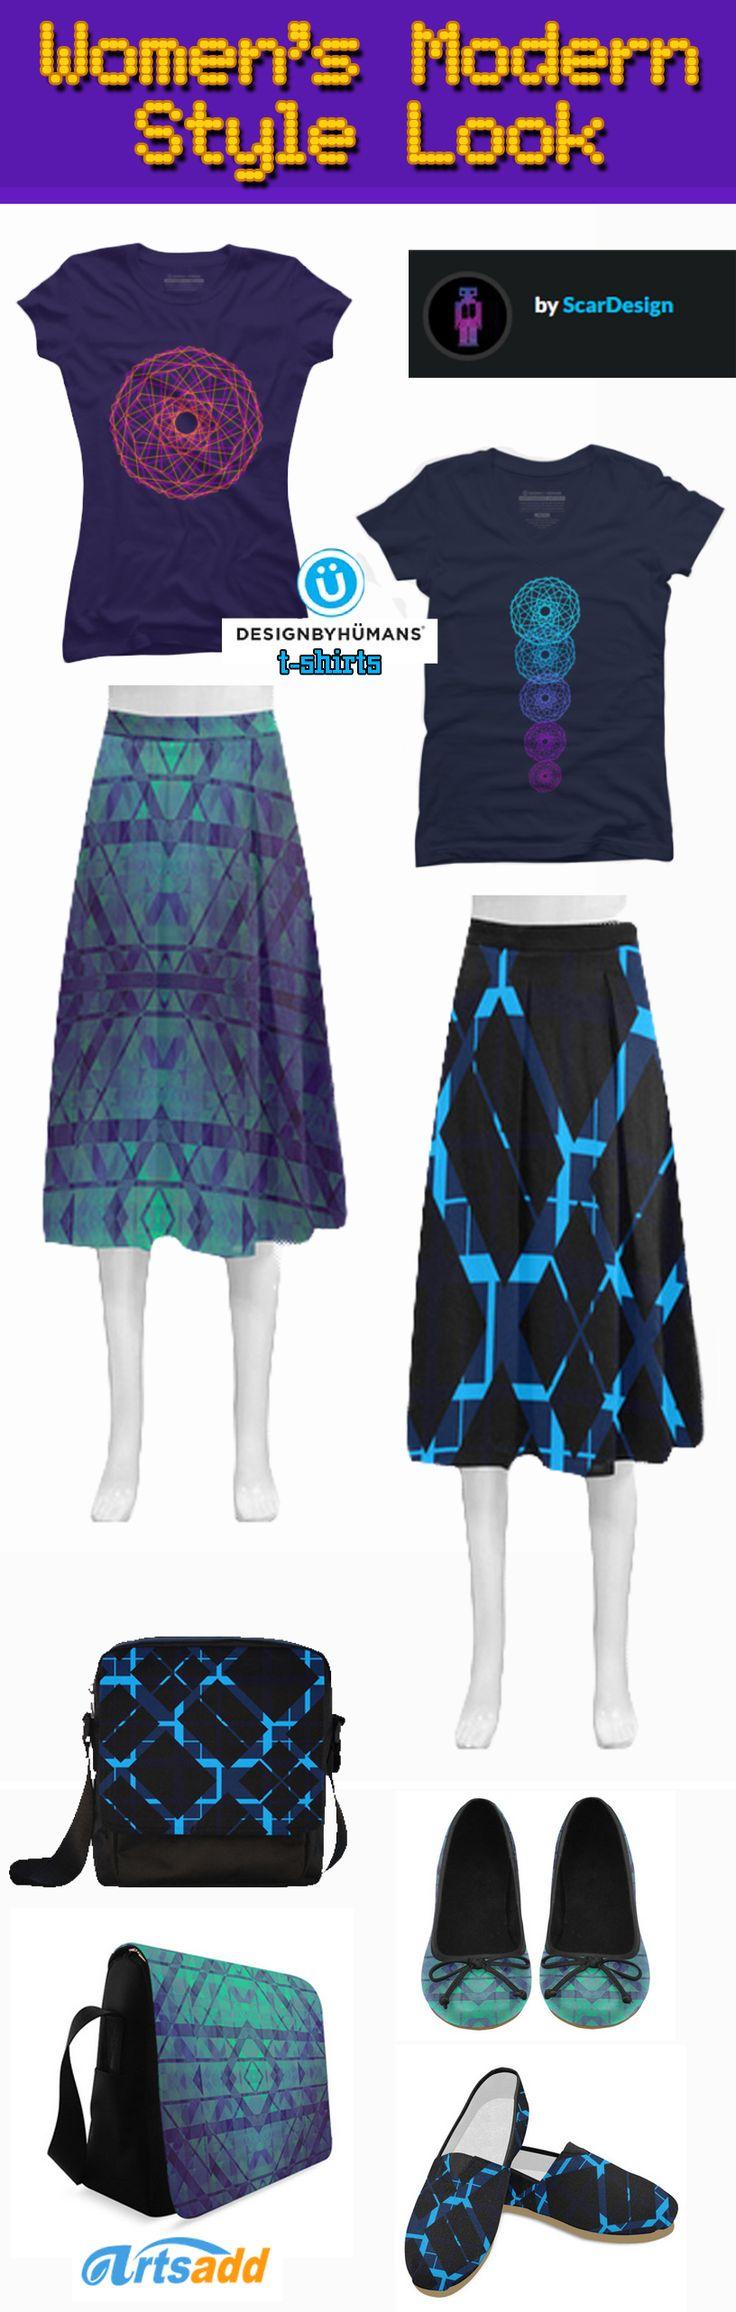 https://www.designbyhumans.com/shop/t-shirt/juniors-v-neck/polygon/215684/ Modern Style Look by Scar Design.  #modernlook #look #messengerbag #buythislook #modernstyle #style #casualwomen #fashion #bag #shoes #canvasshoes #spring #springshoes #skirt #tshirt #womenstshirts #giftsforher #colorful #gifts #designbyhumans #artsadd #scardesign #crossbodybag